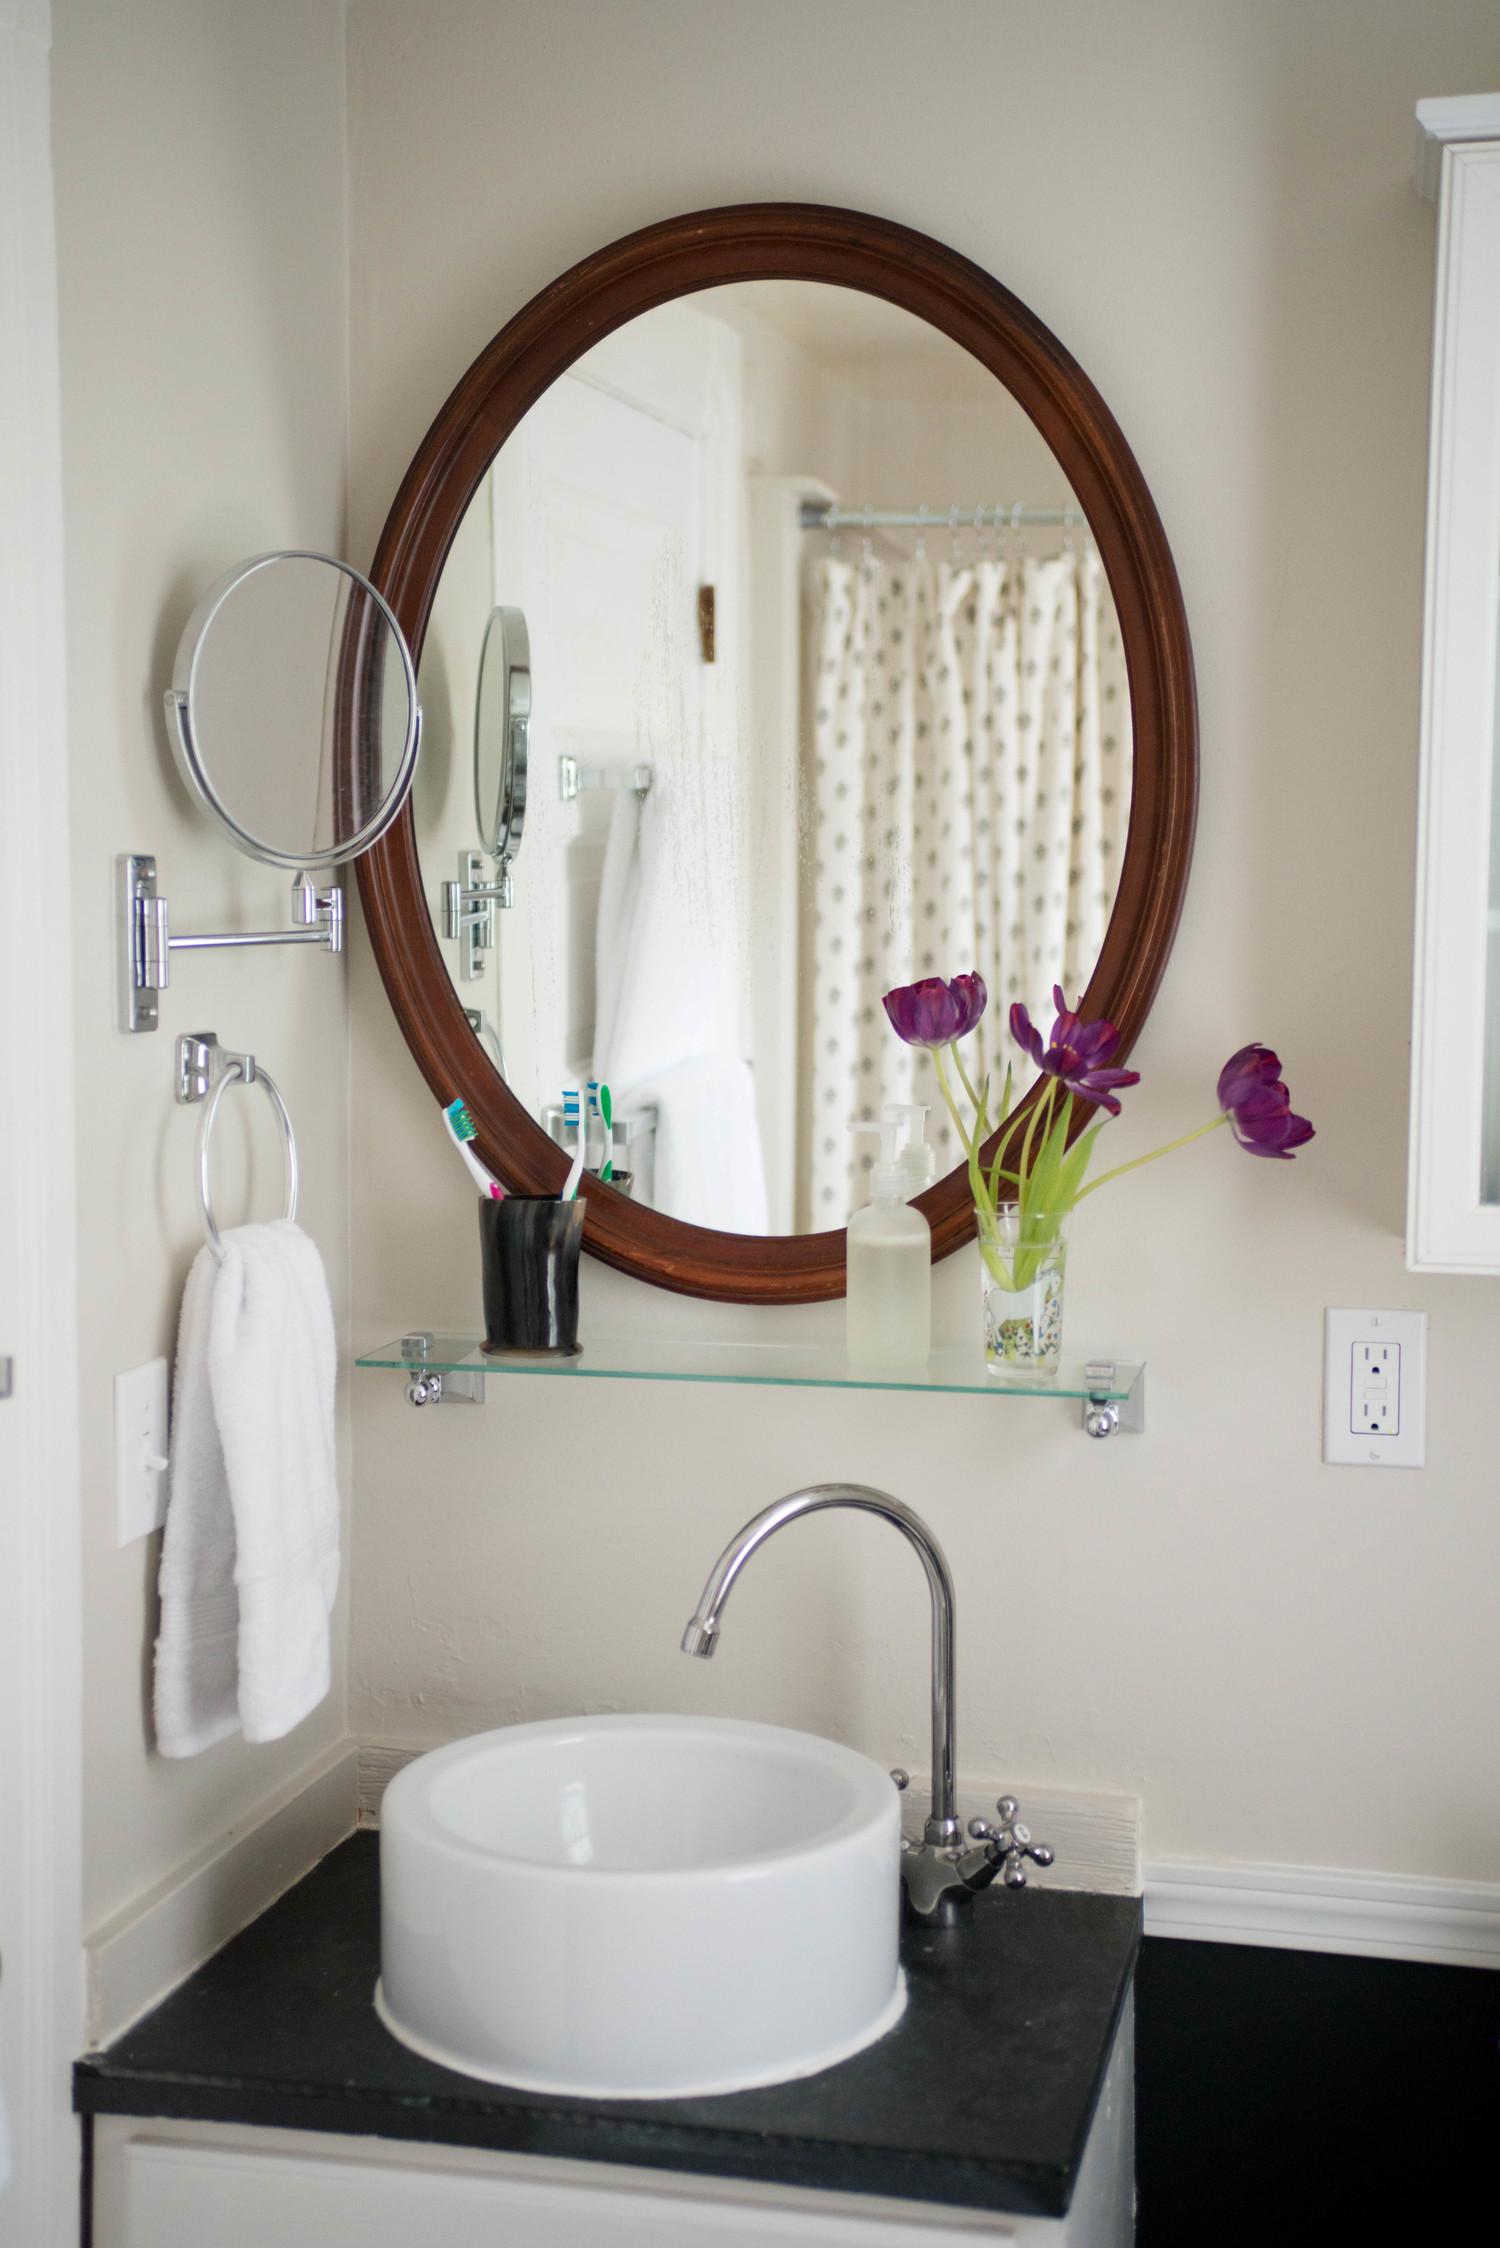 SPACES | Seattle Cottage: Bathroom Updates — FOURTH FLOOR WALK UP